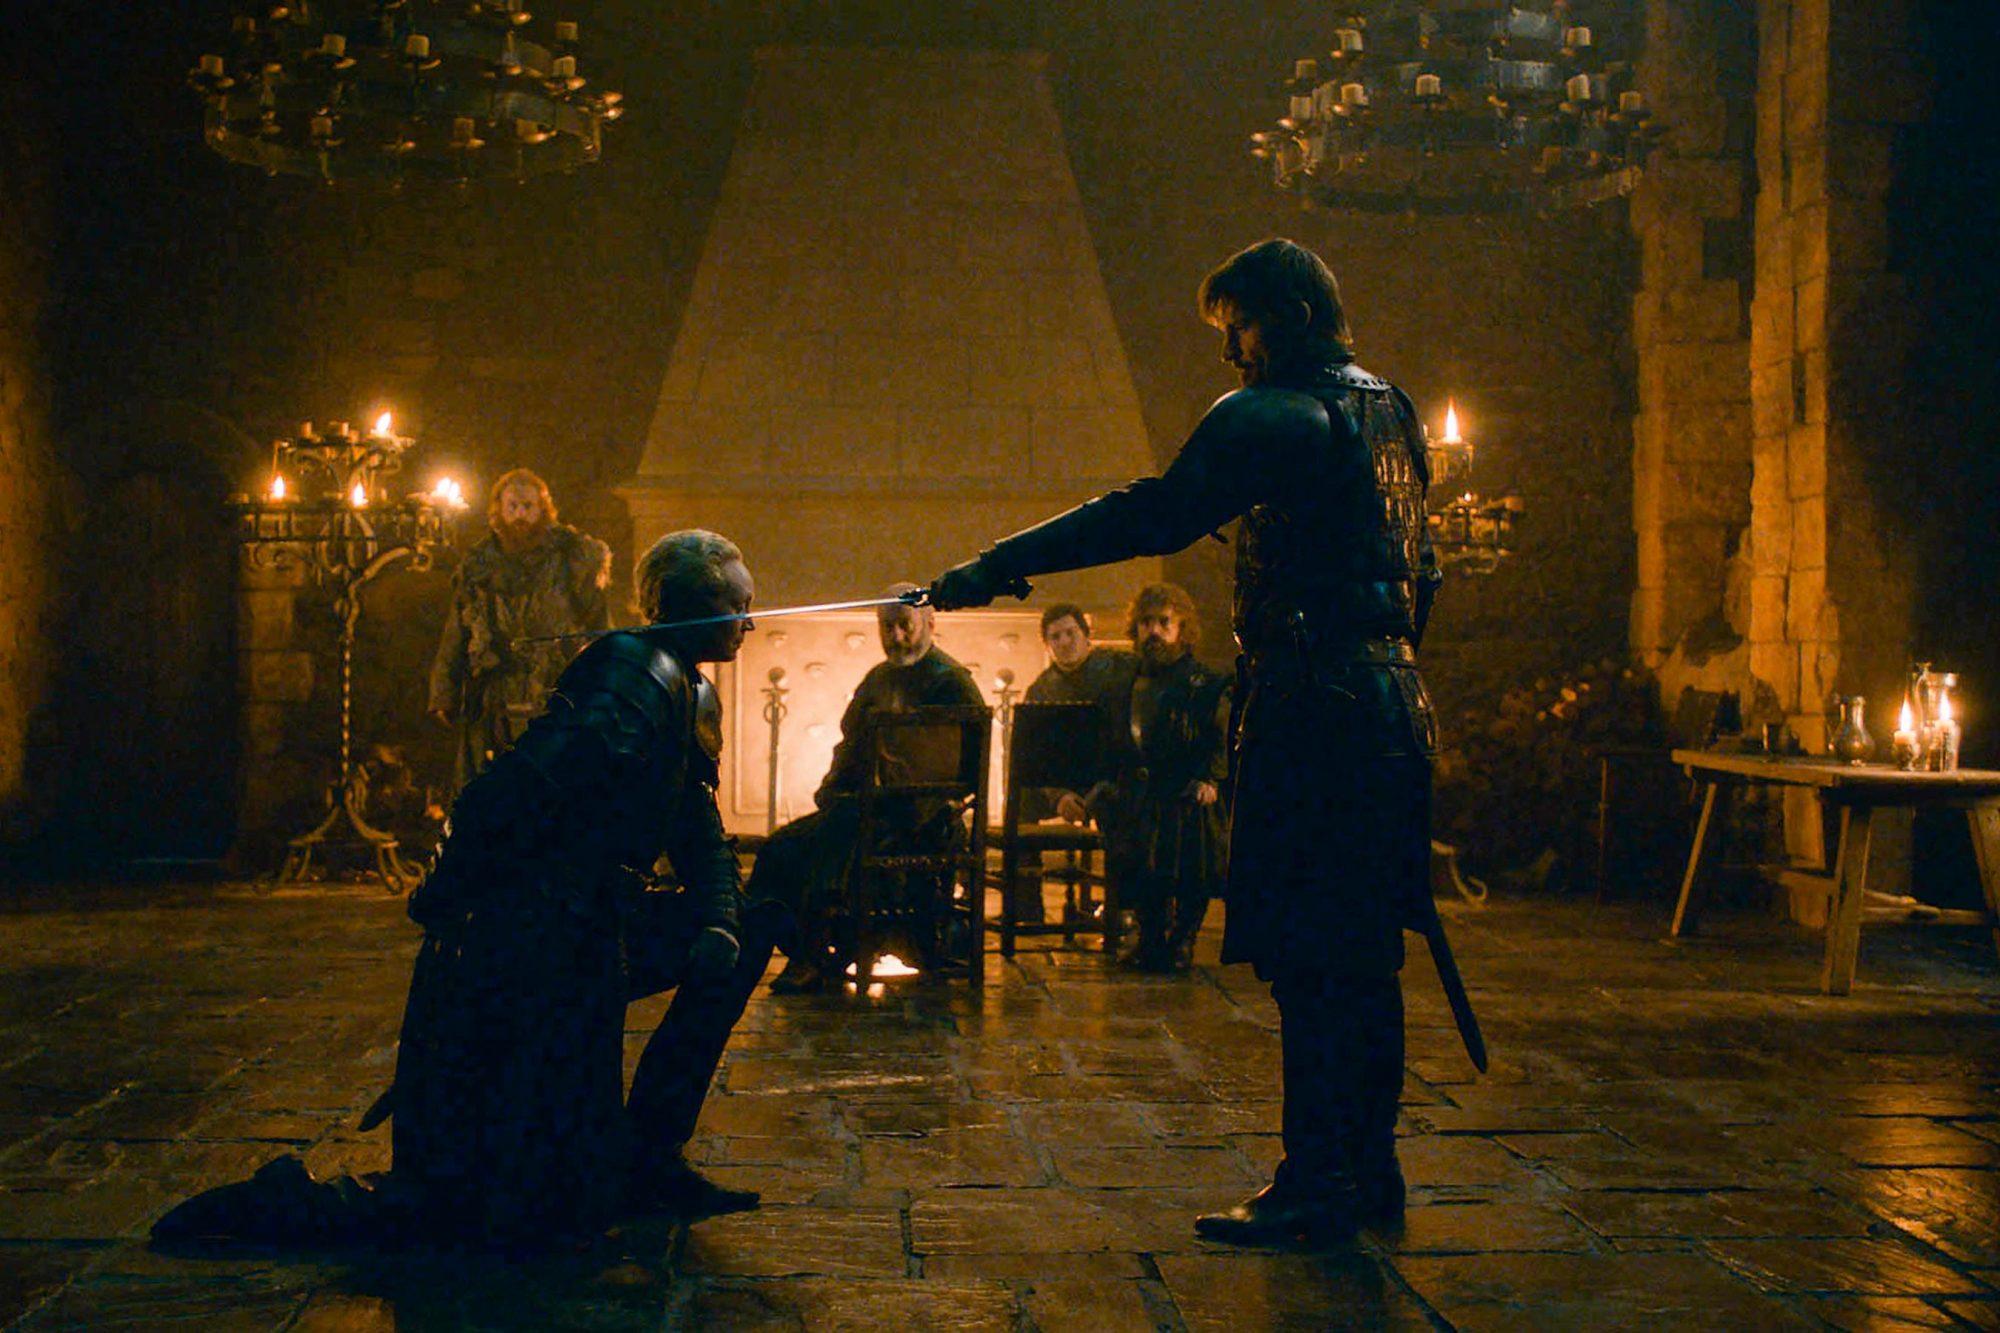 Game of Thrones Season 8, episode 2